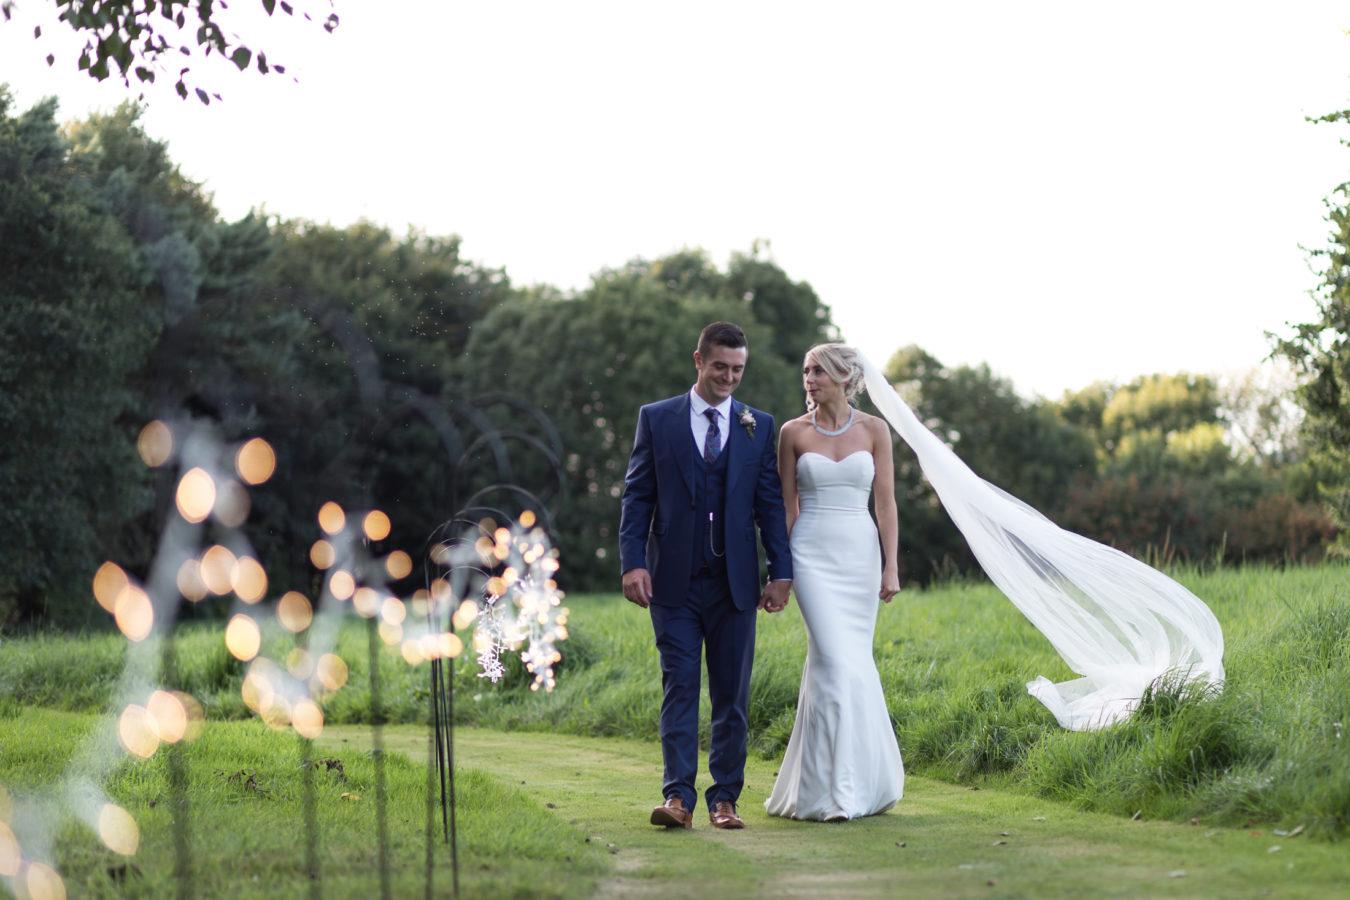 Goldsborough wedding Amanda Manby photography